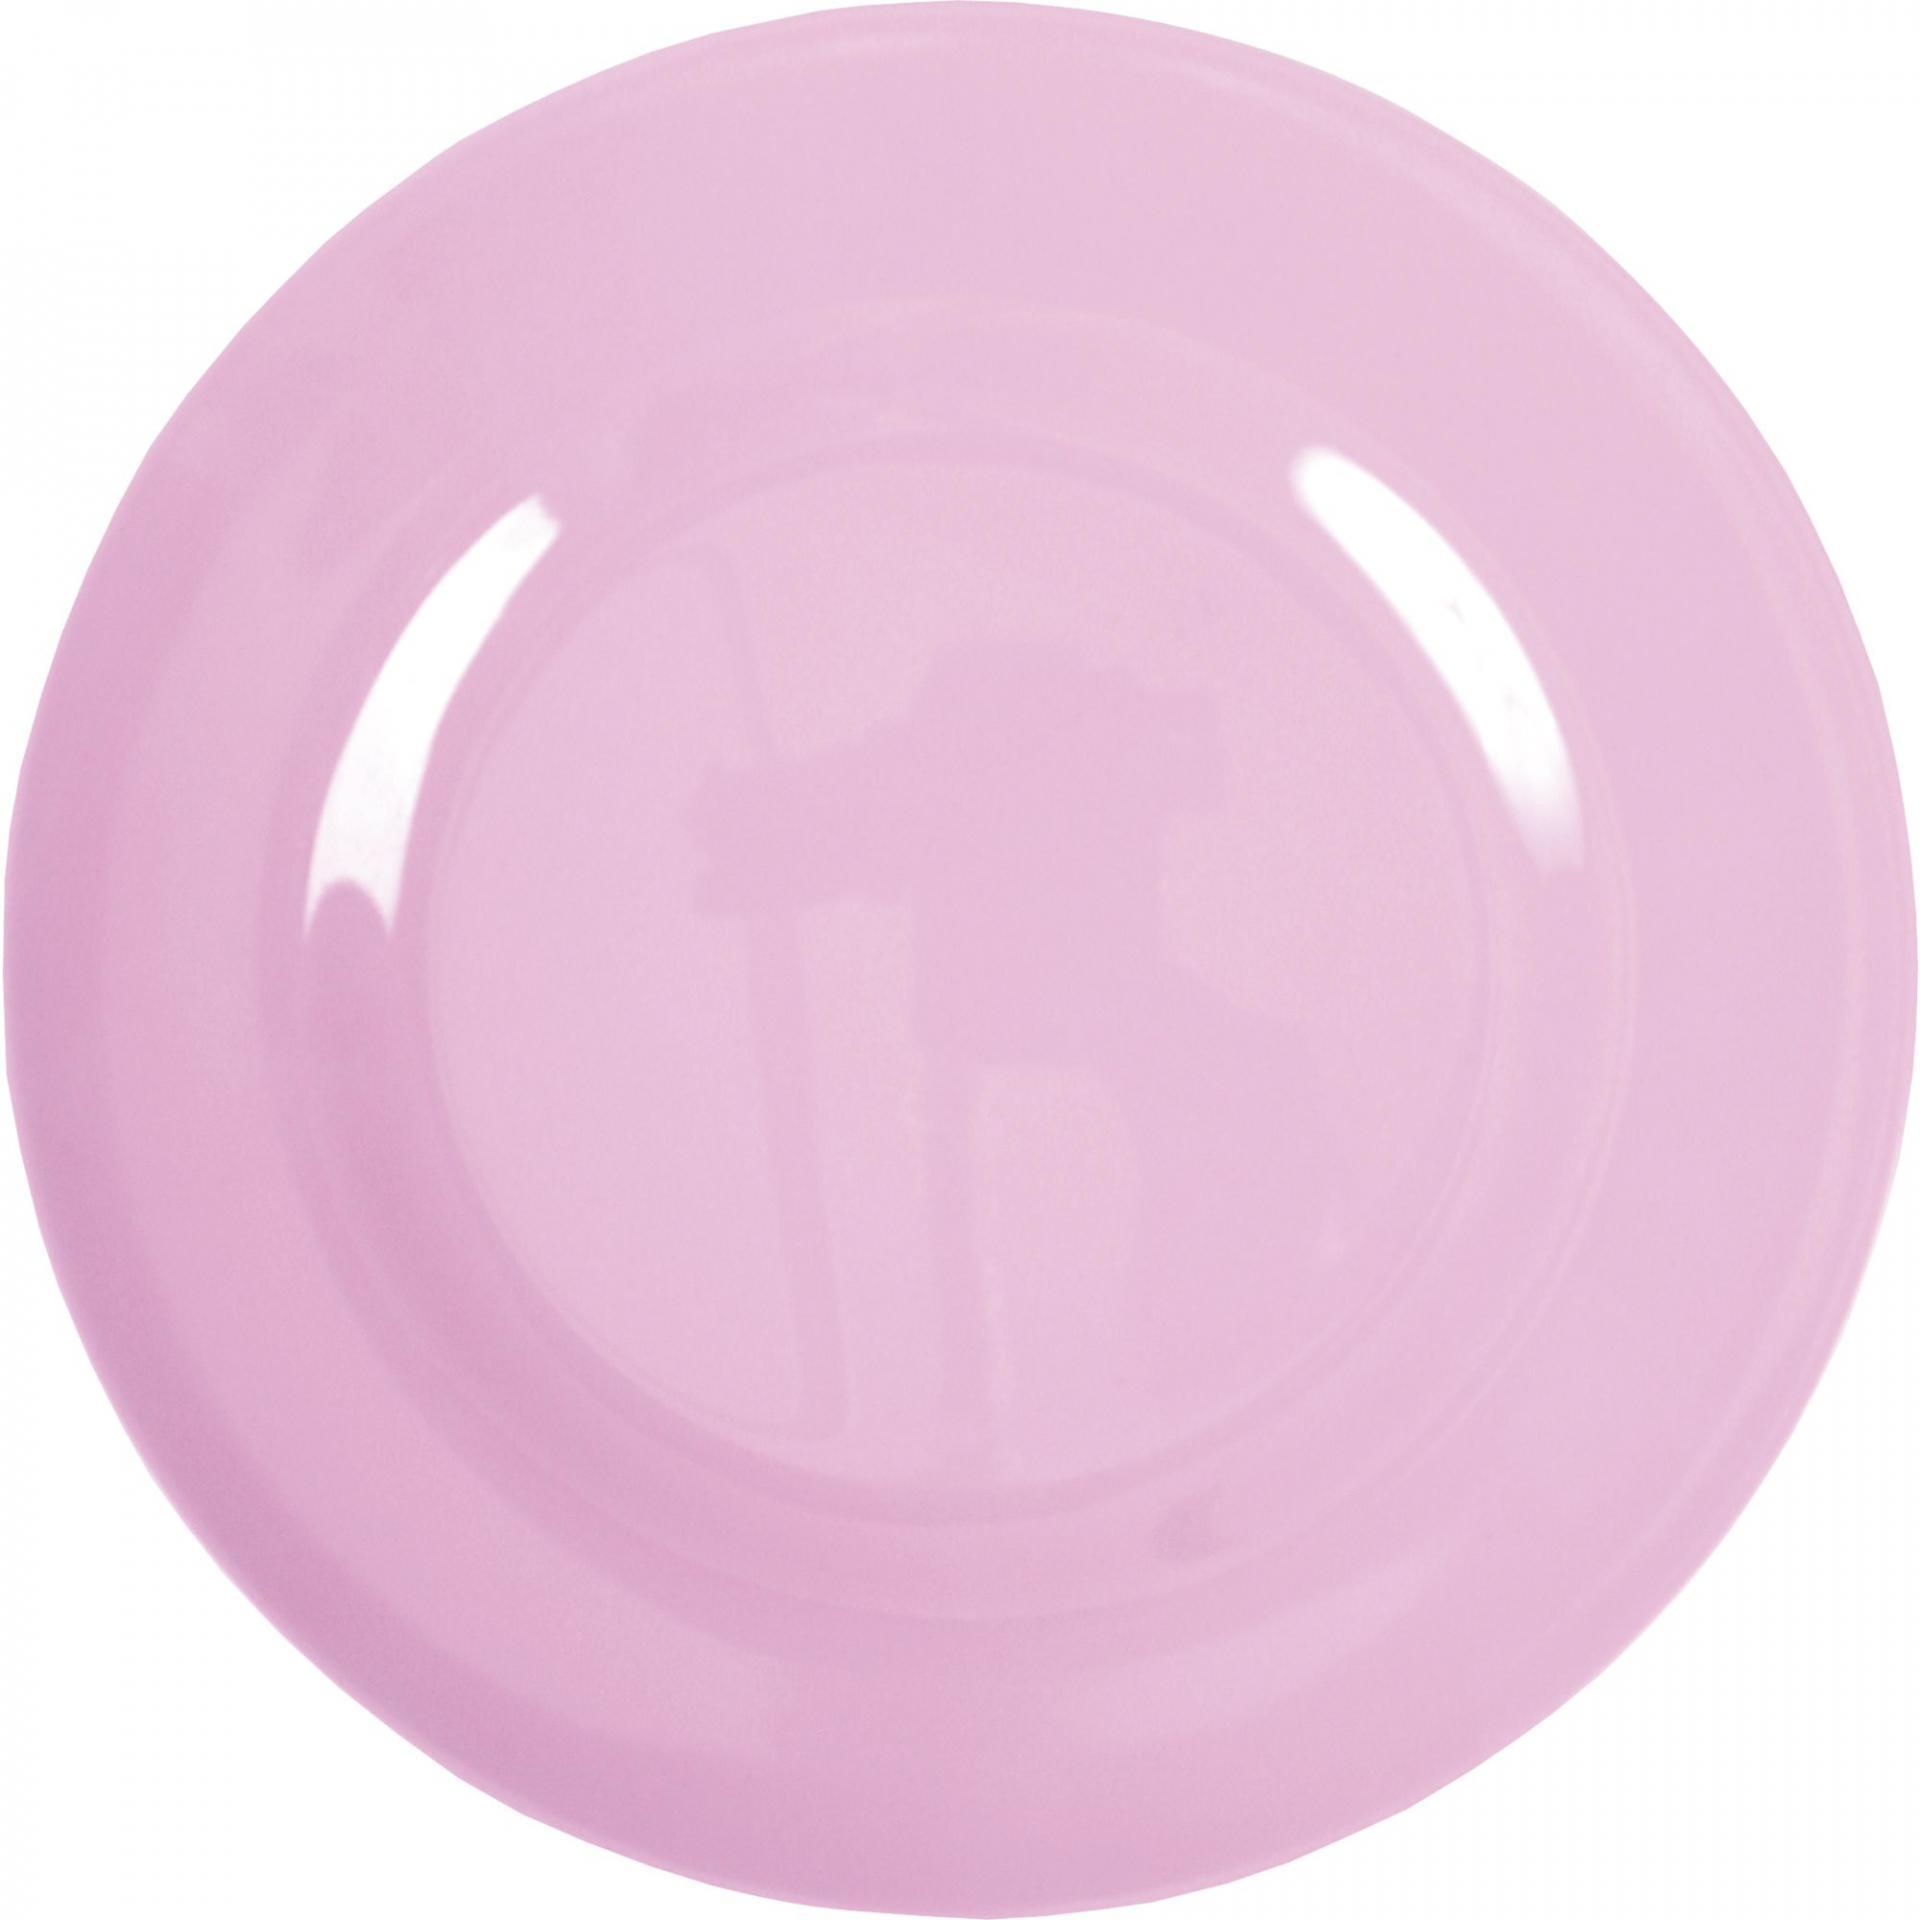 rice Melaminový talíř Pink, růžová barva, melamin 25 cm